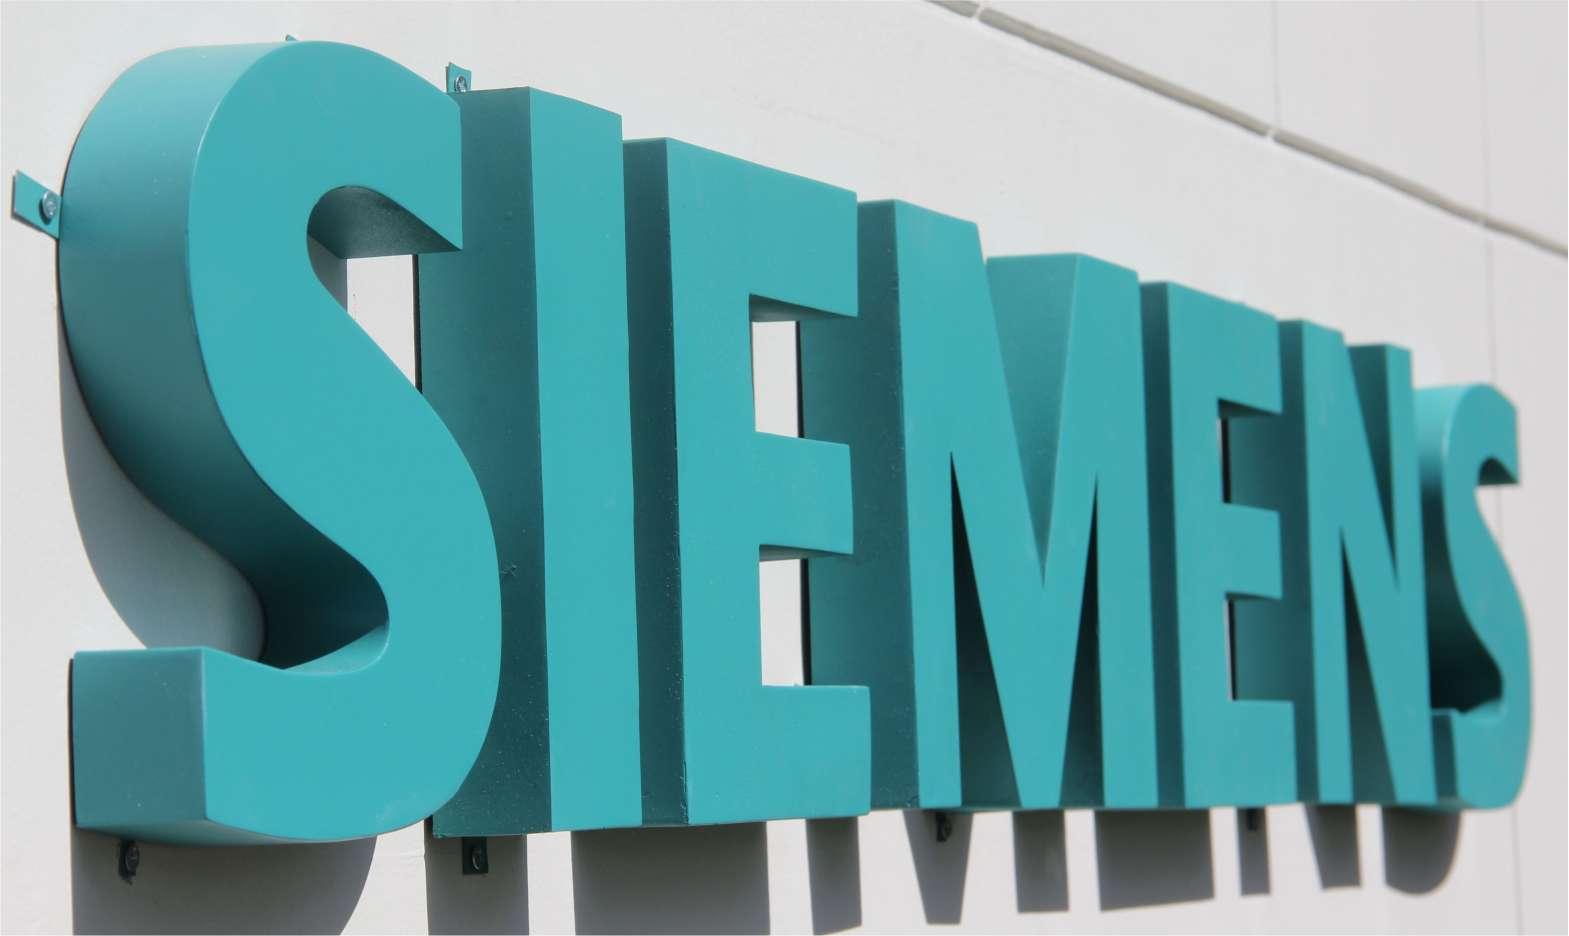 Siemens.